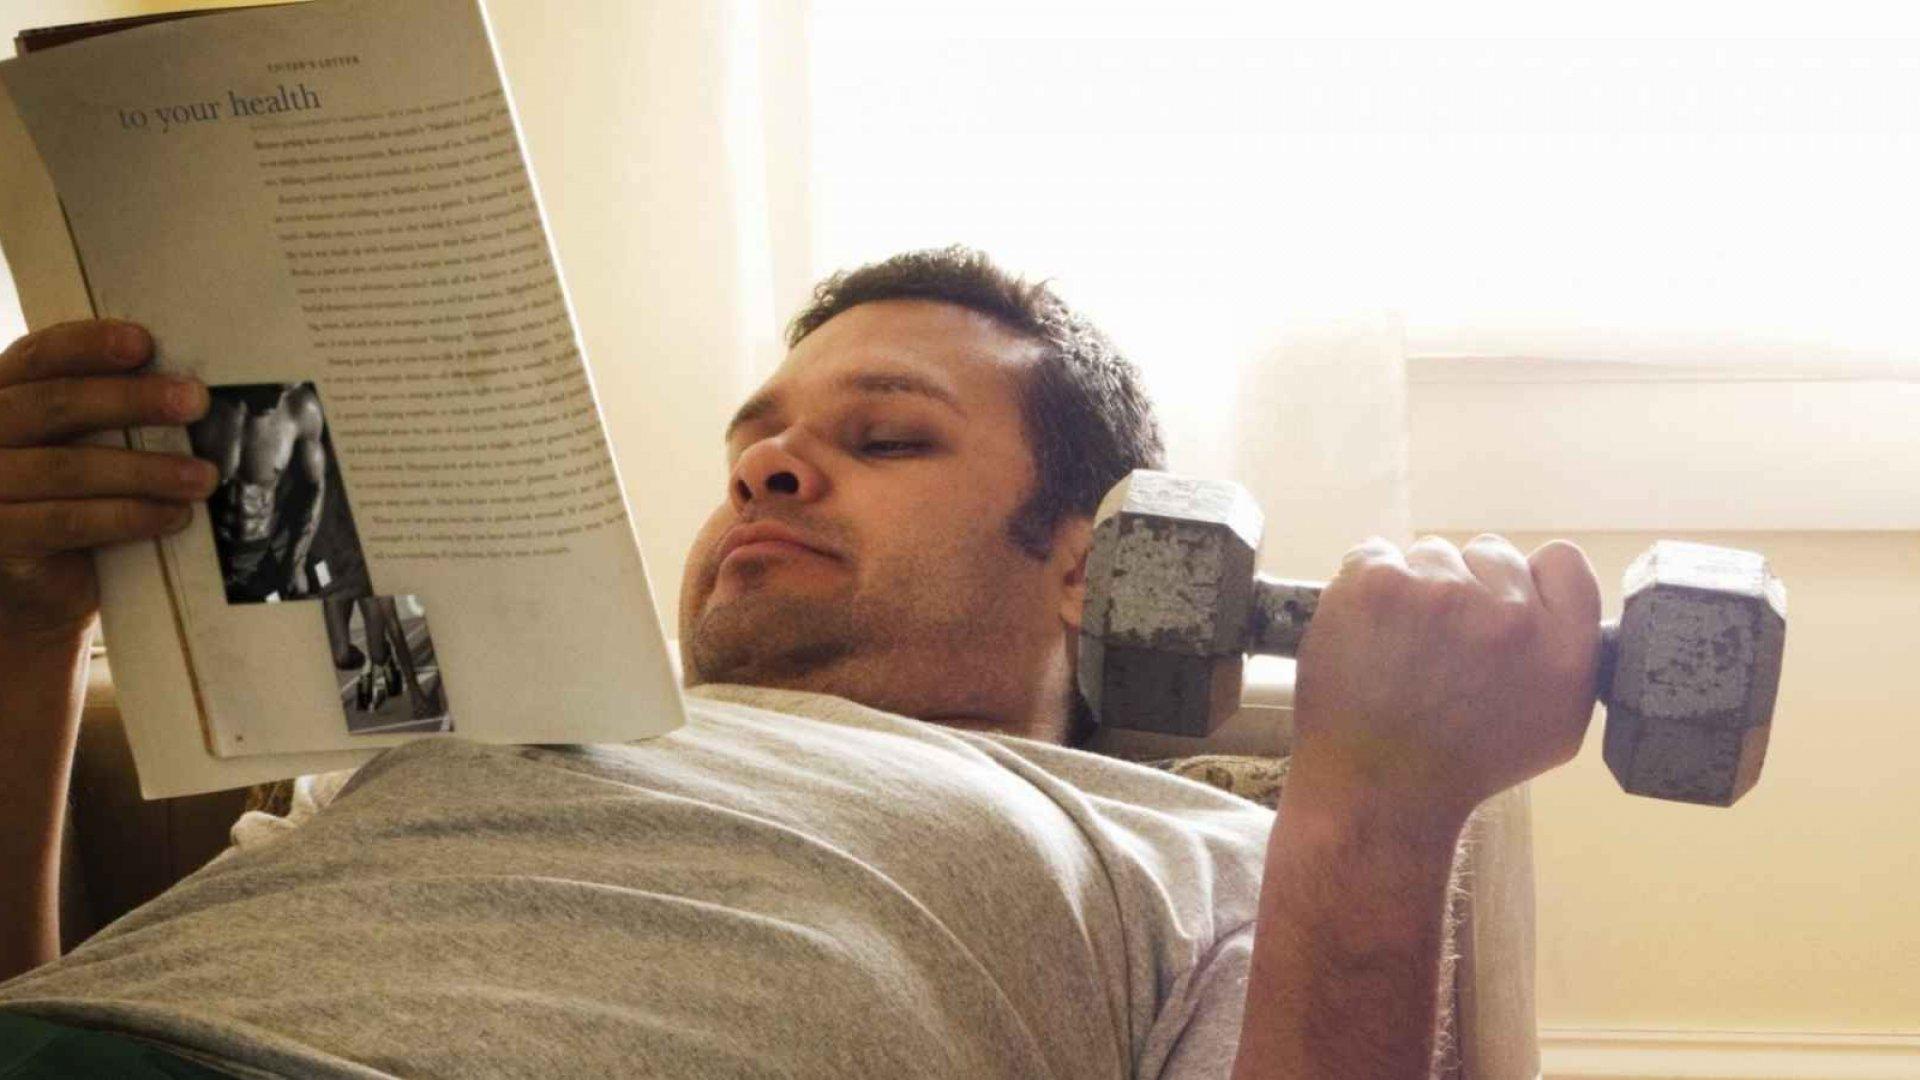 5 Procrastination 'Hacks' for the Secretly Lazy